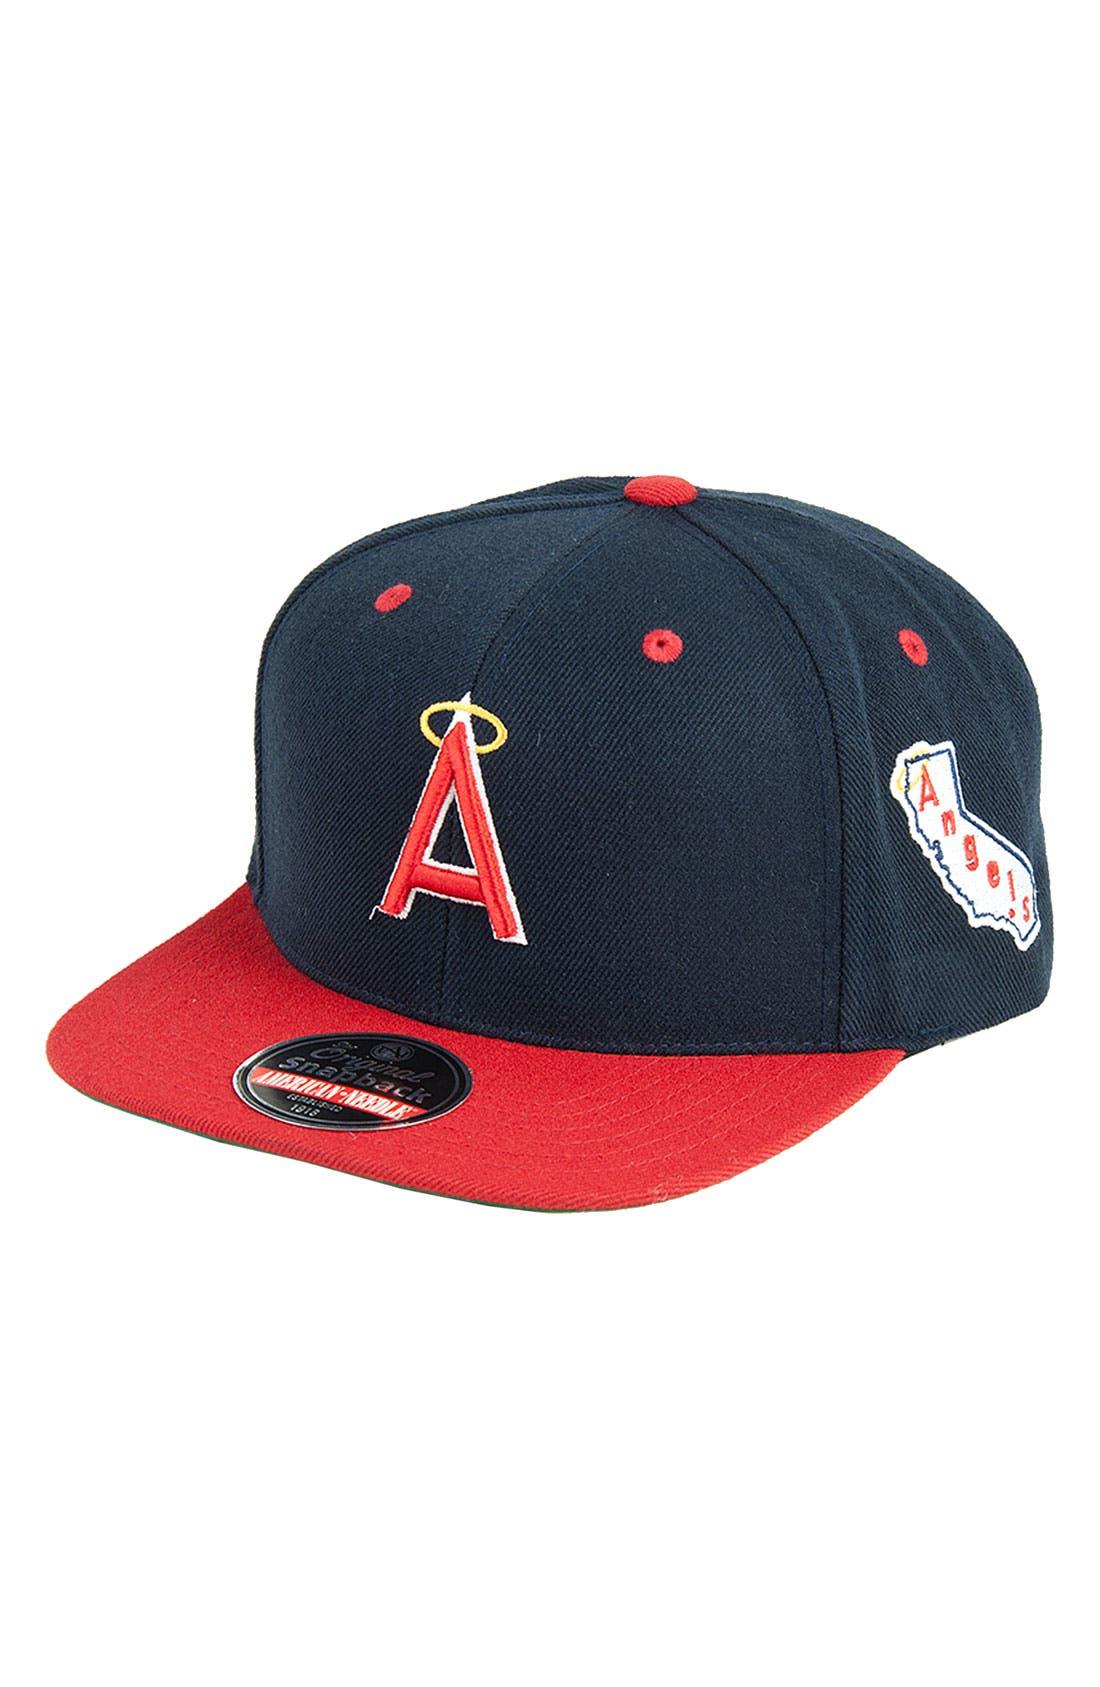 Main Image - American Needle 'Blockhead Angels' Snapback Baseball Cap